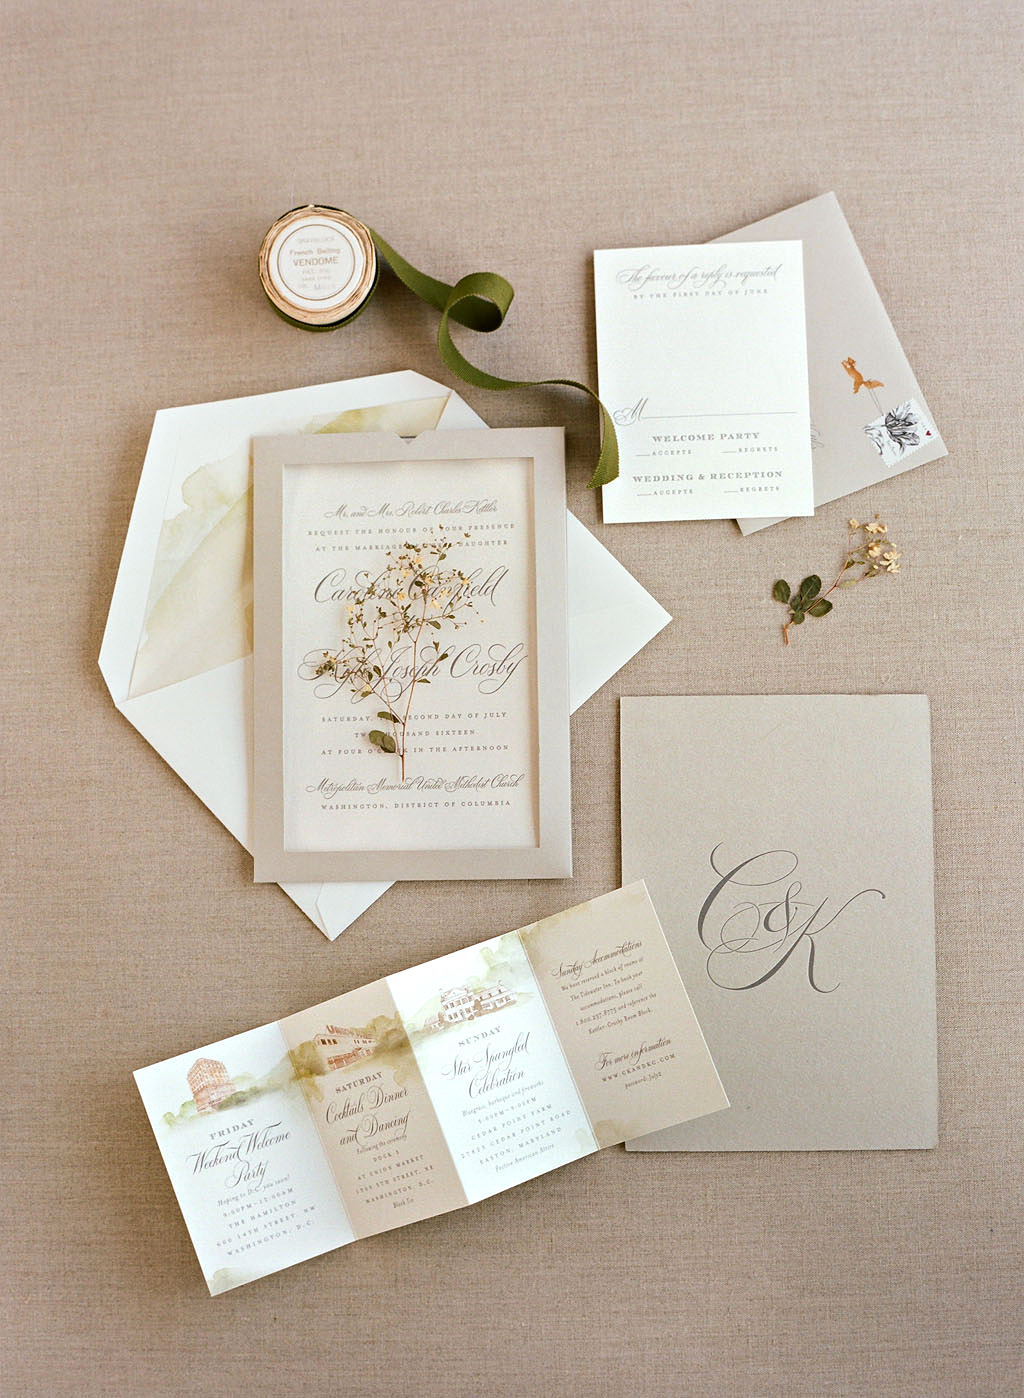 caroline kyle wedding stationery suite